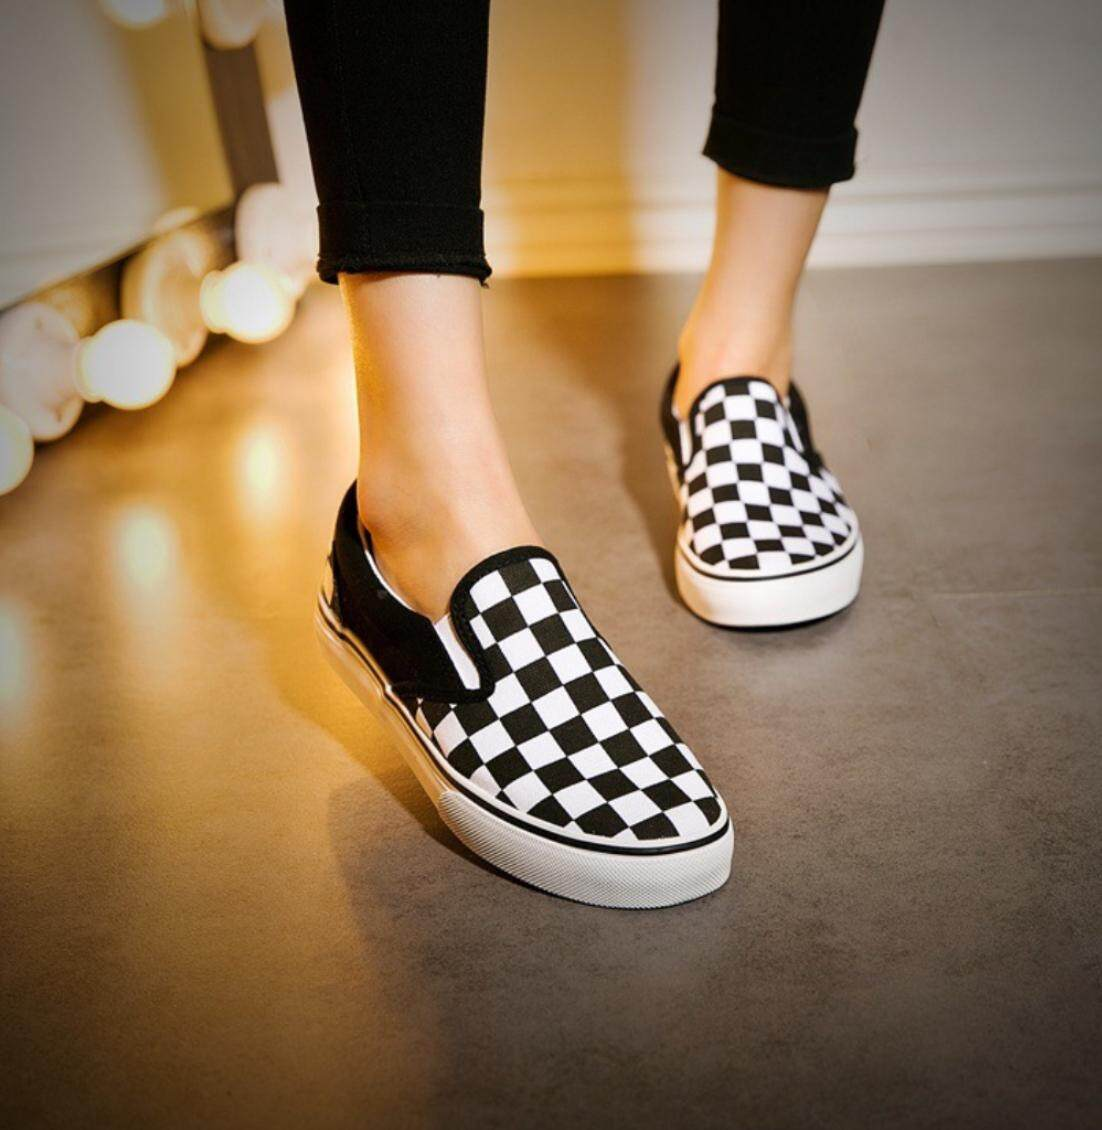 MARIAN รองเท้าผ้าใบผู้หญิง สไตล์แบรนด์ดัง รุ่นฮิต A0158 | Lazada.co.th